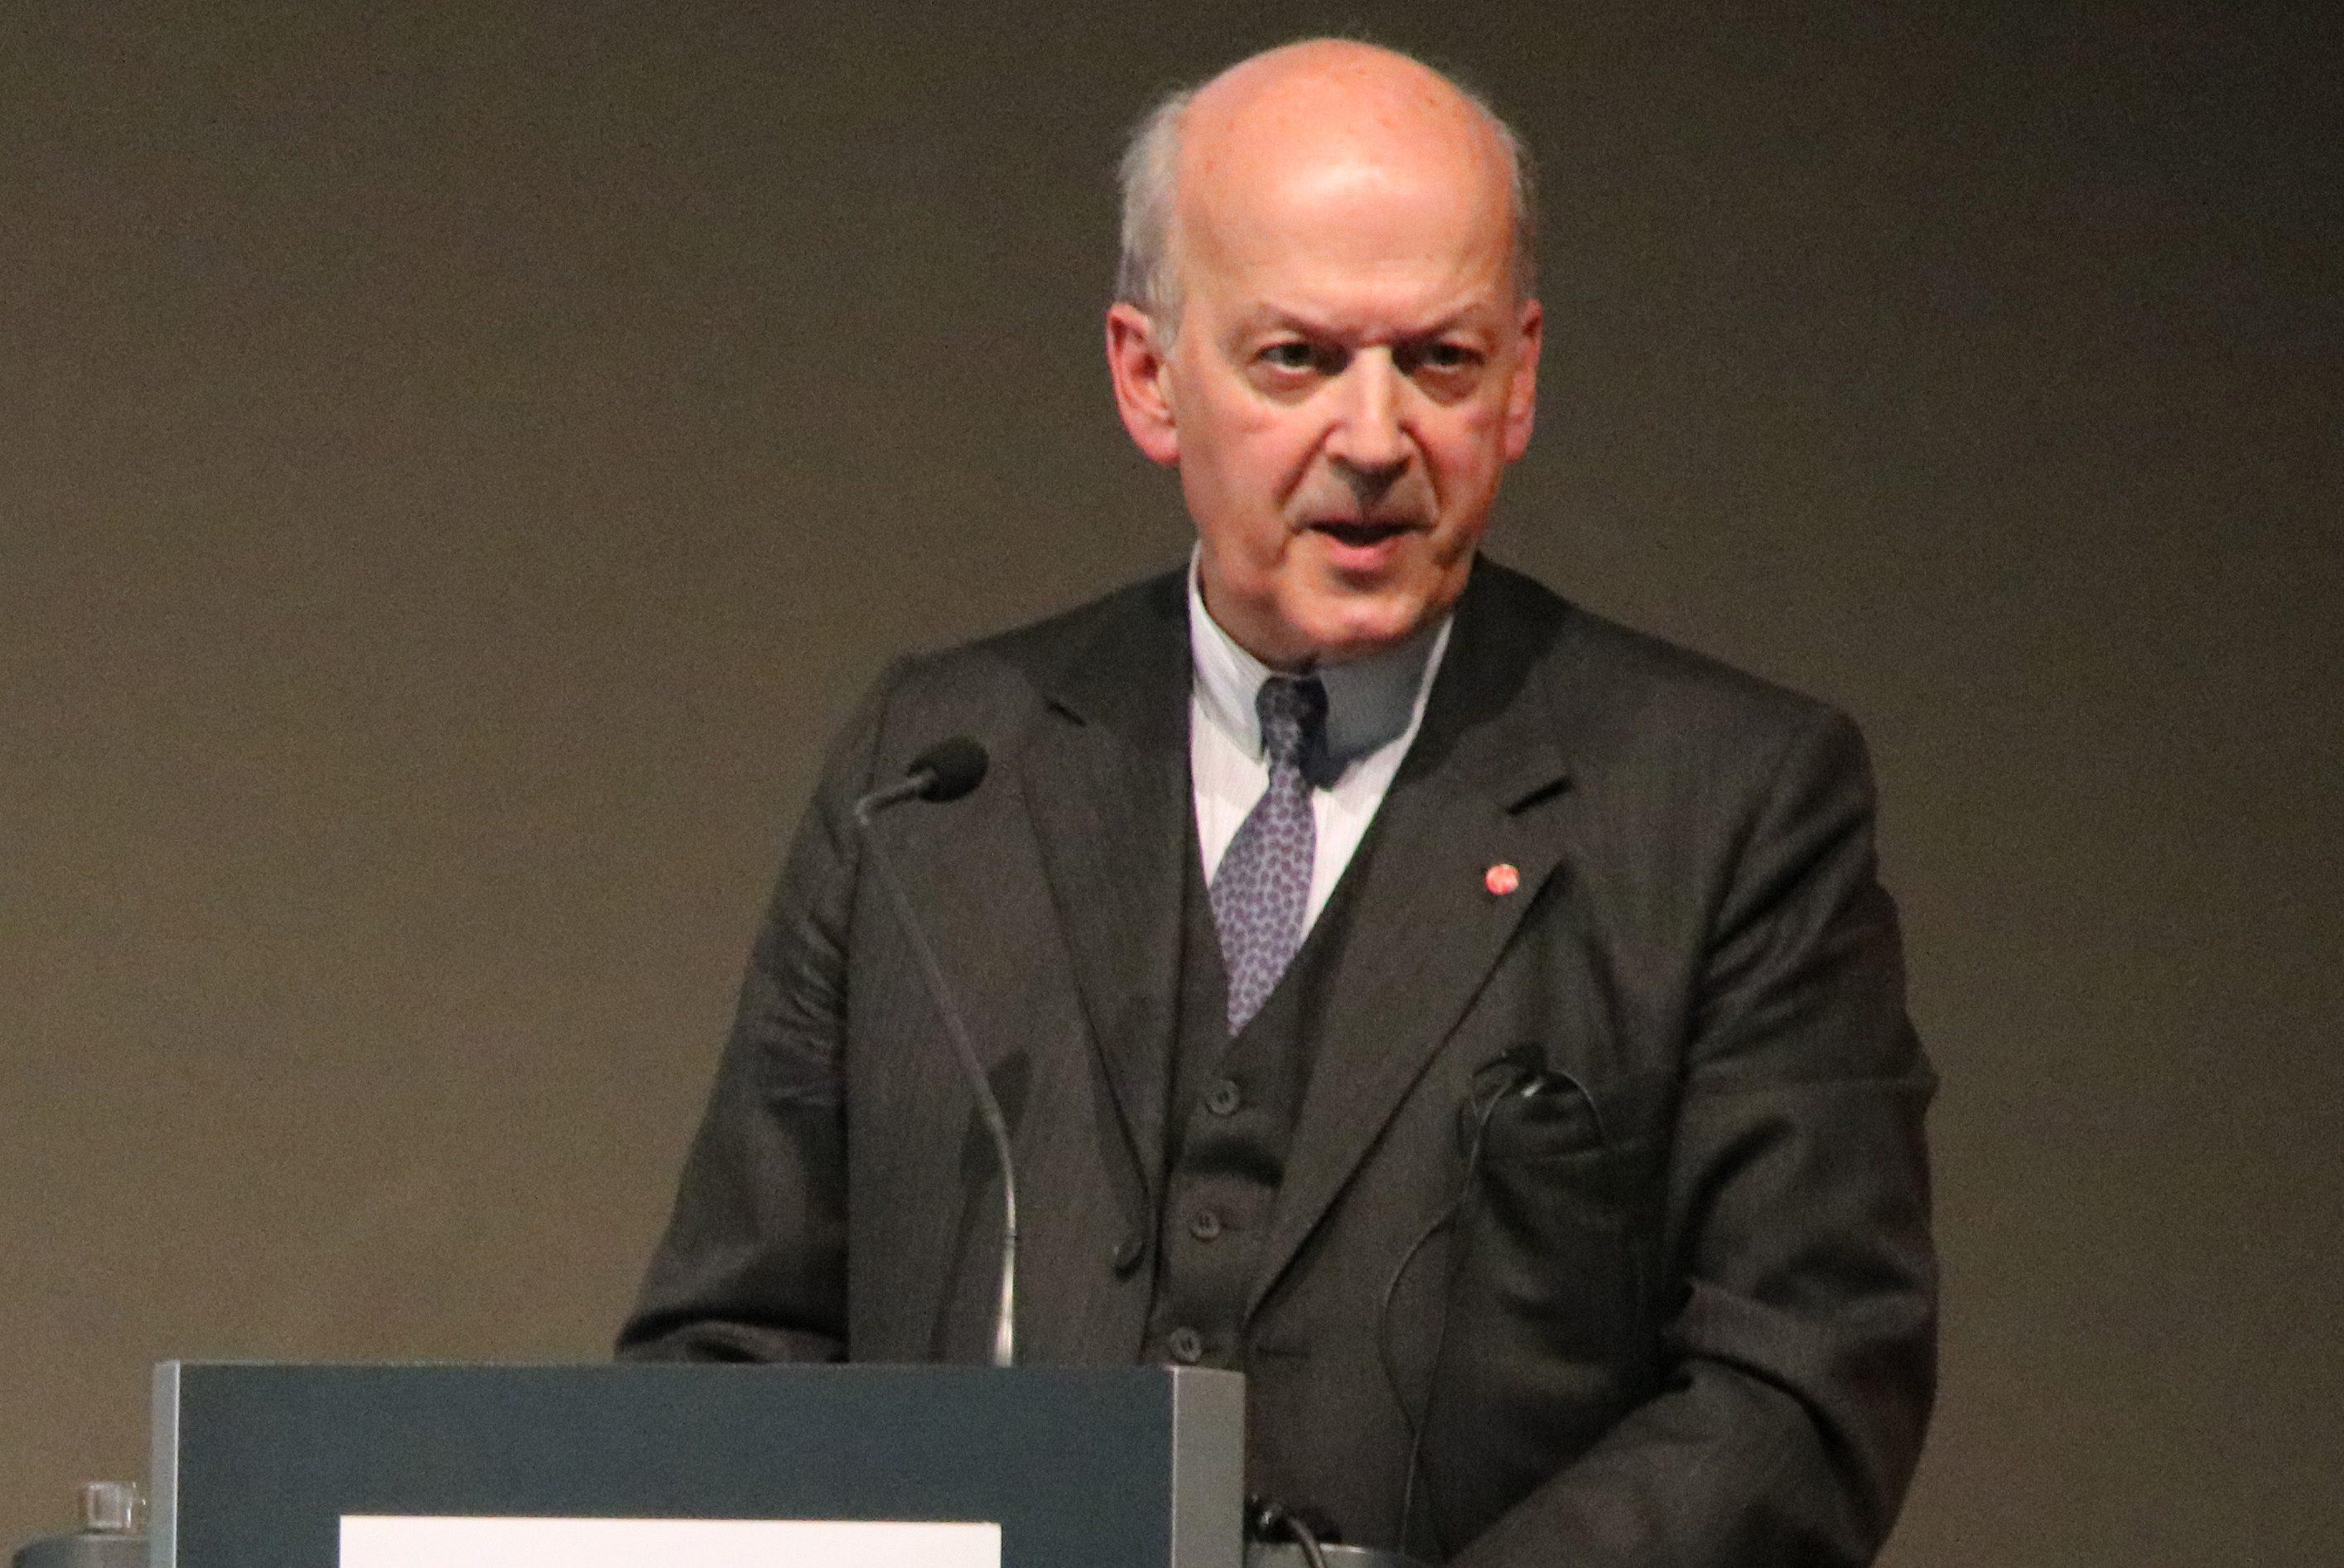 Dr Thomas Heine-Geldern, international executive president of Aid to the Church in Need